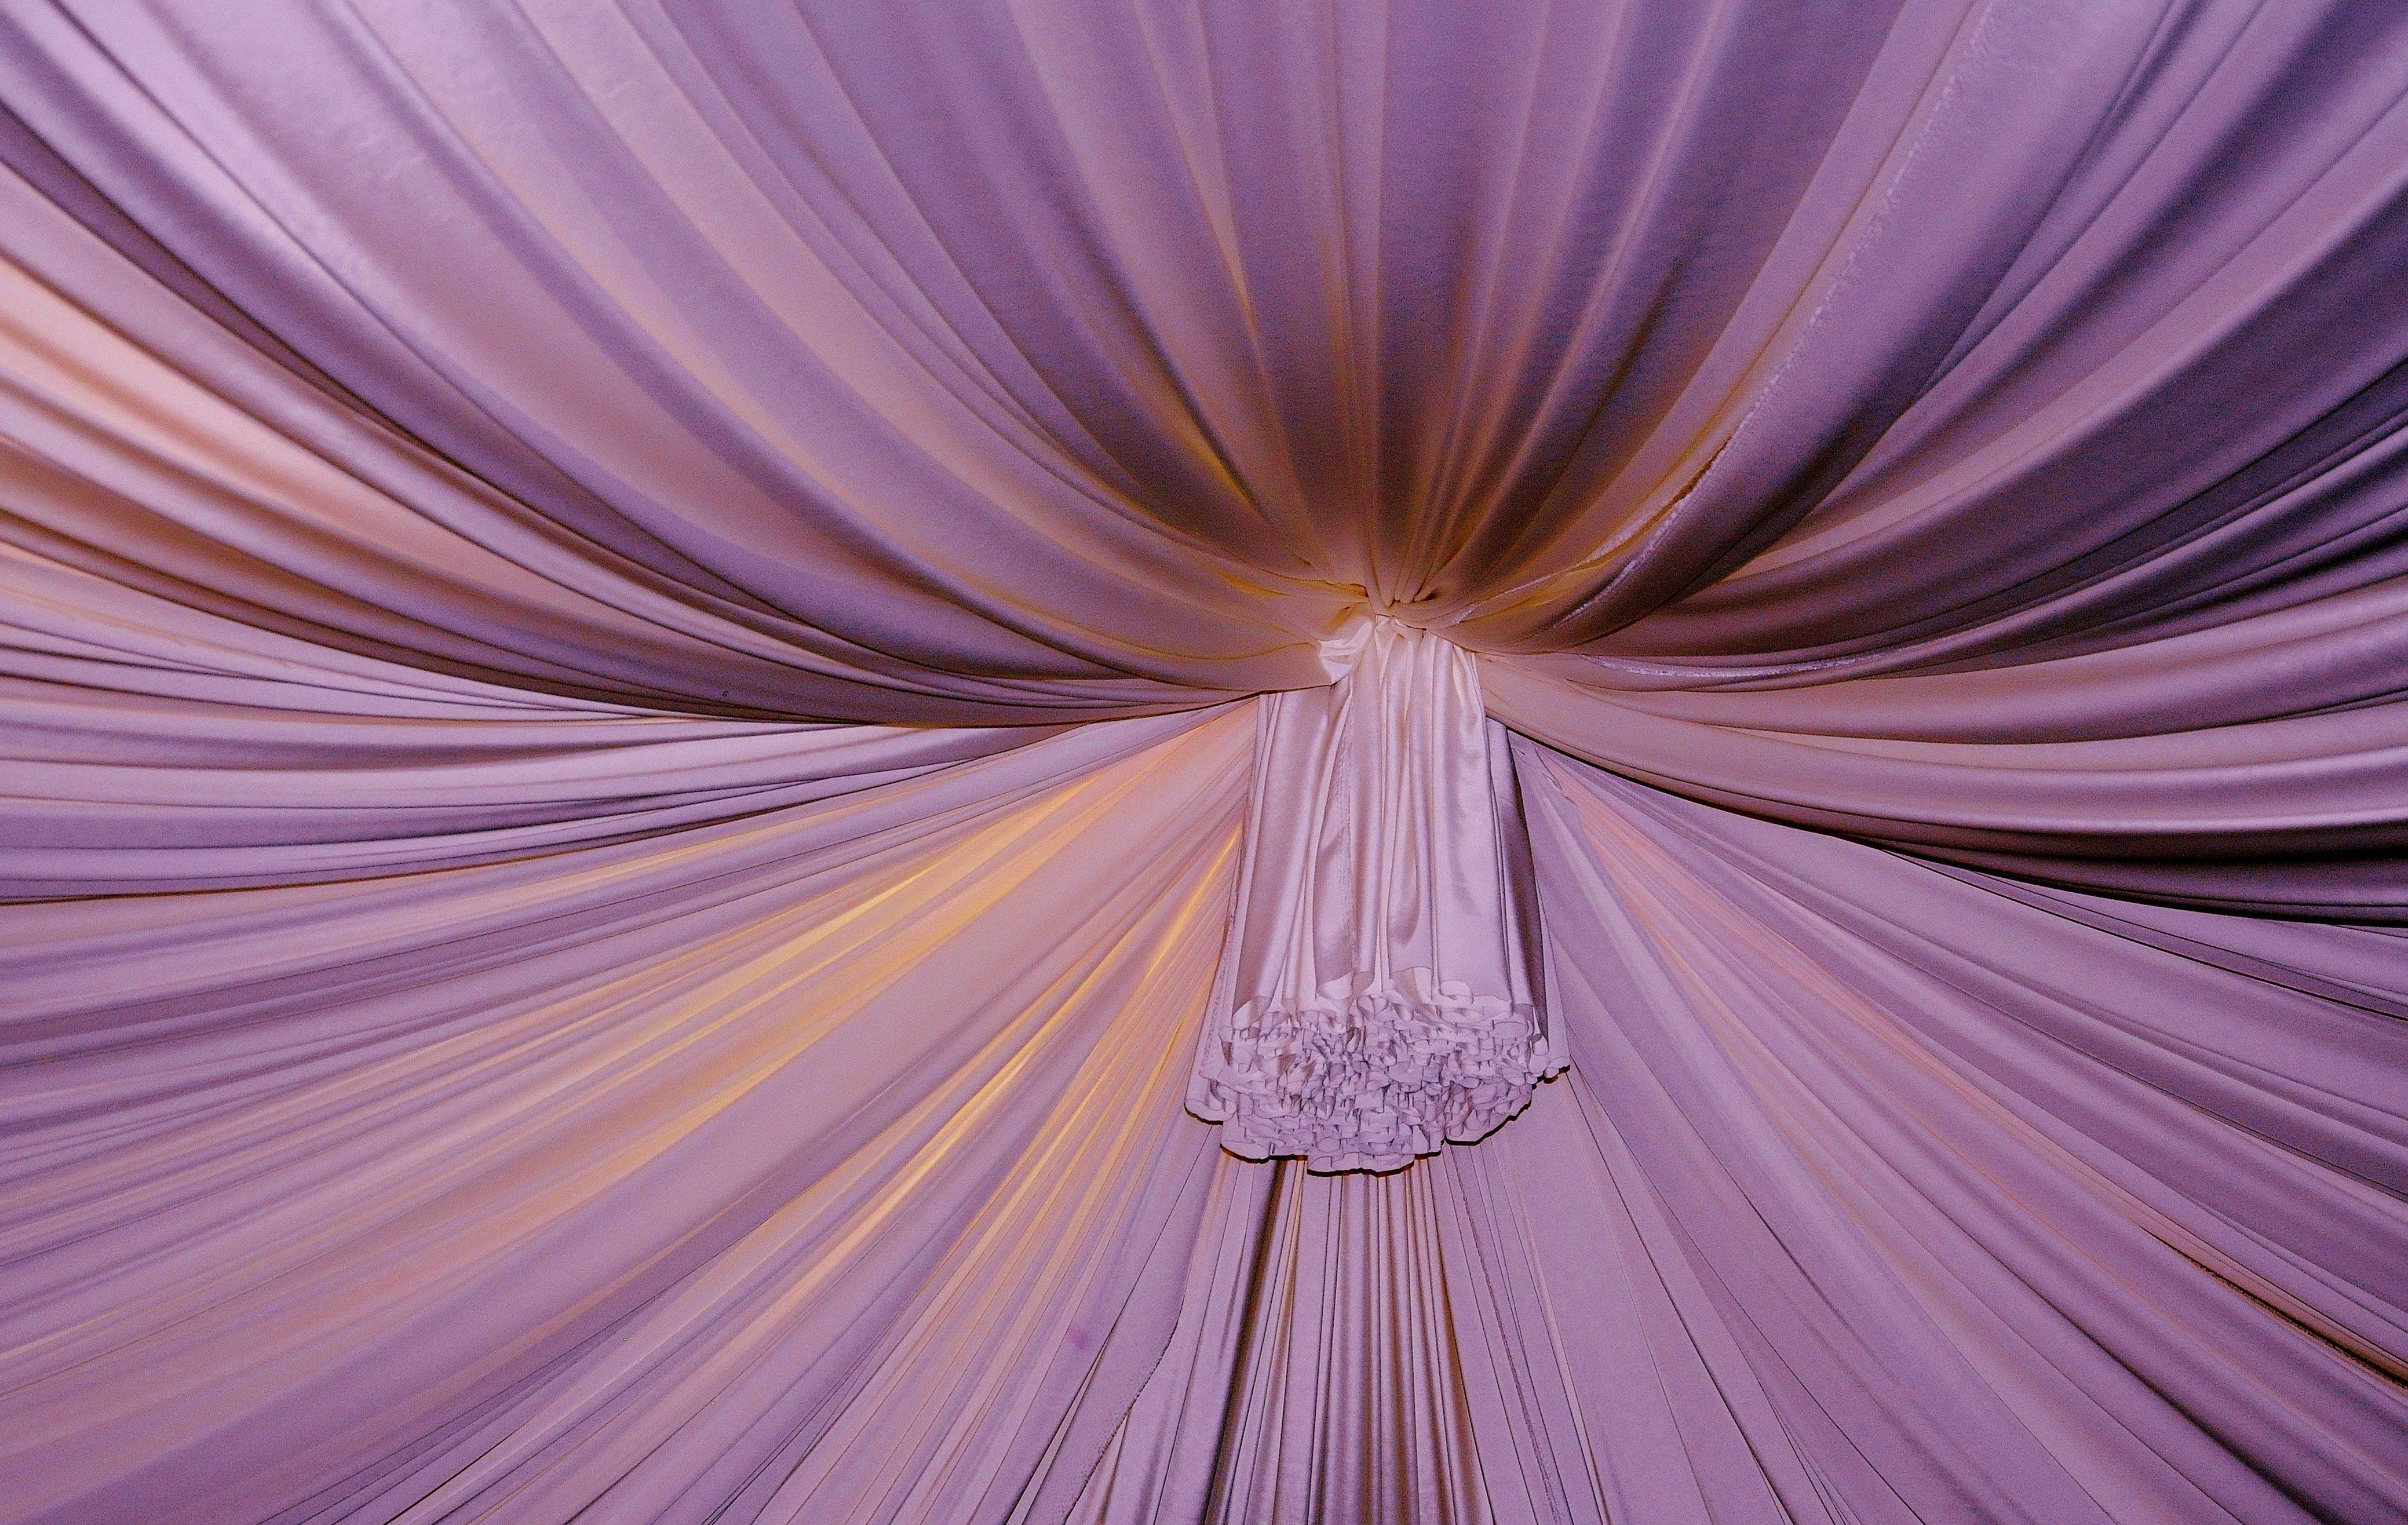 Free Images Sunlight Flower Purple Petal Color Hanging Pink